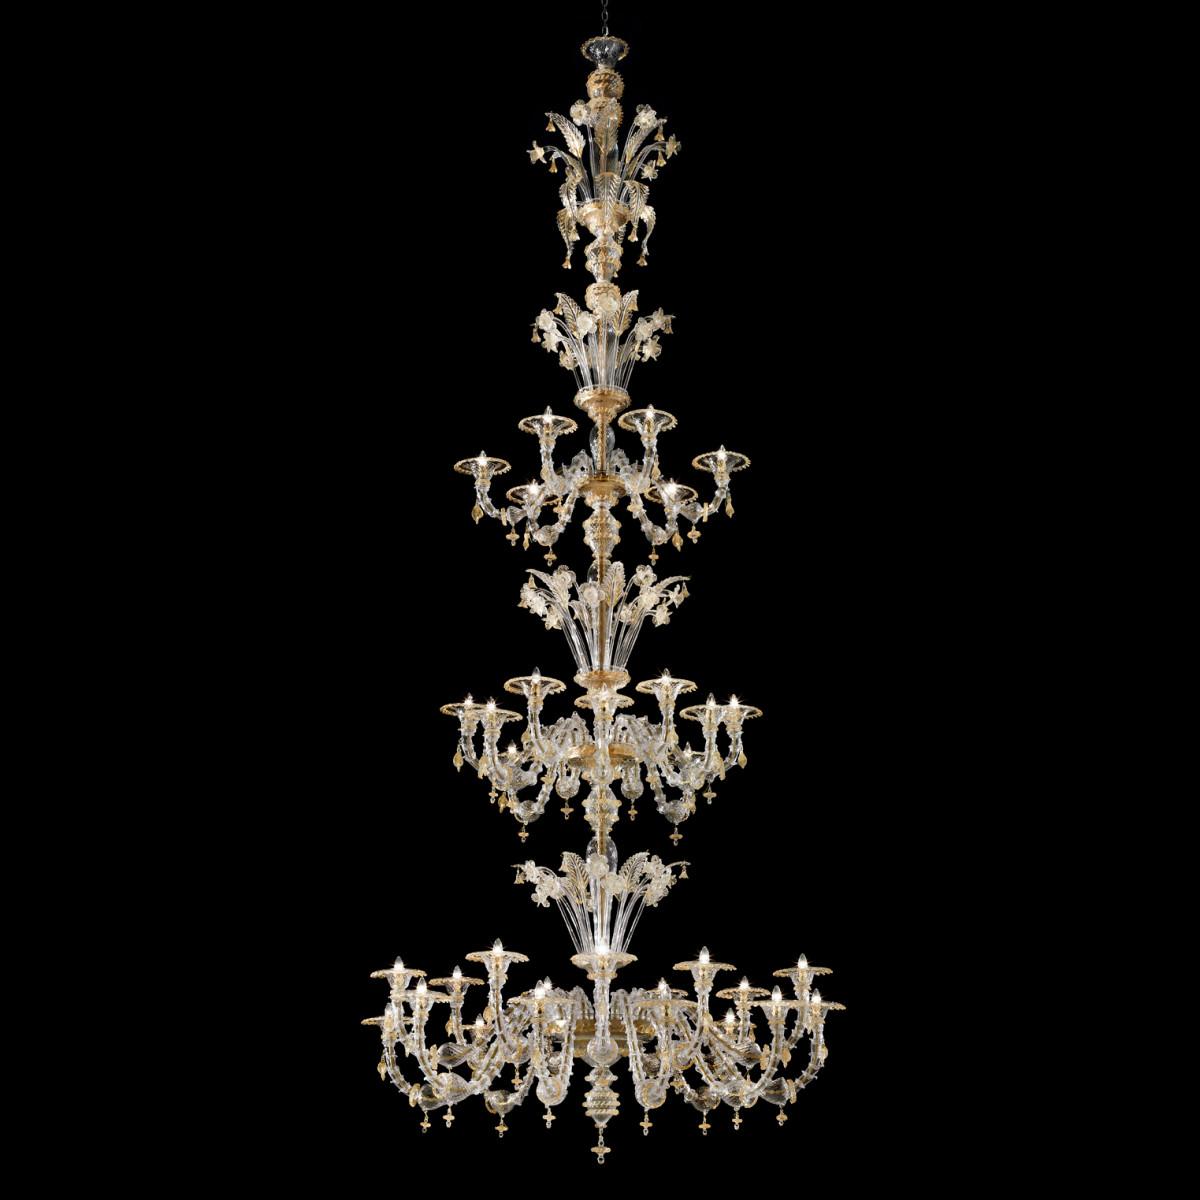 Bellini lampara de araña de Murano - color transparente oro 24k